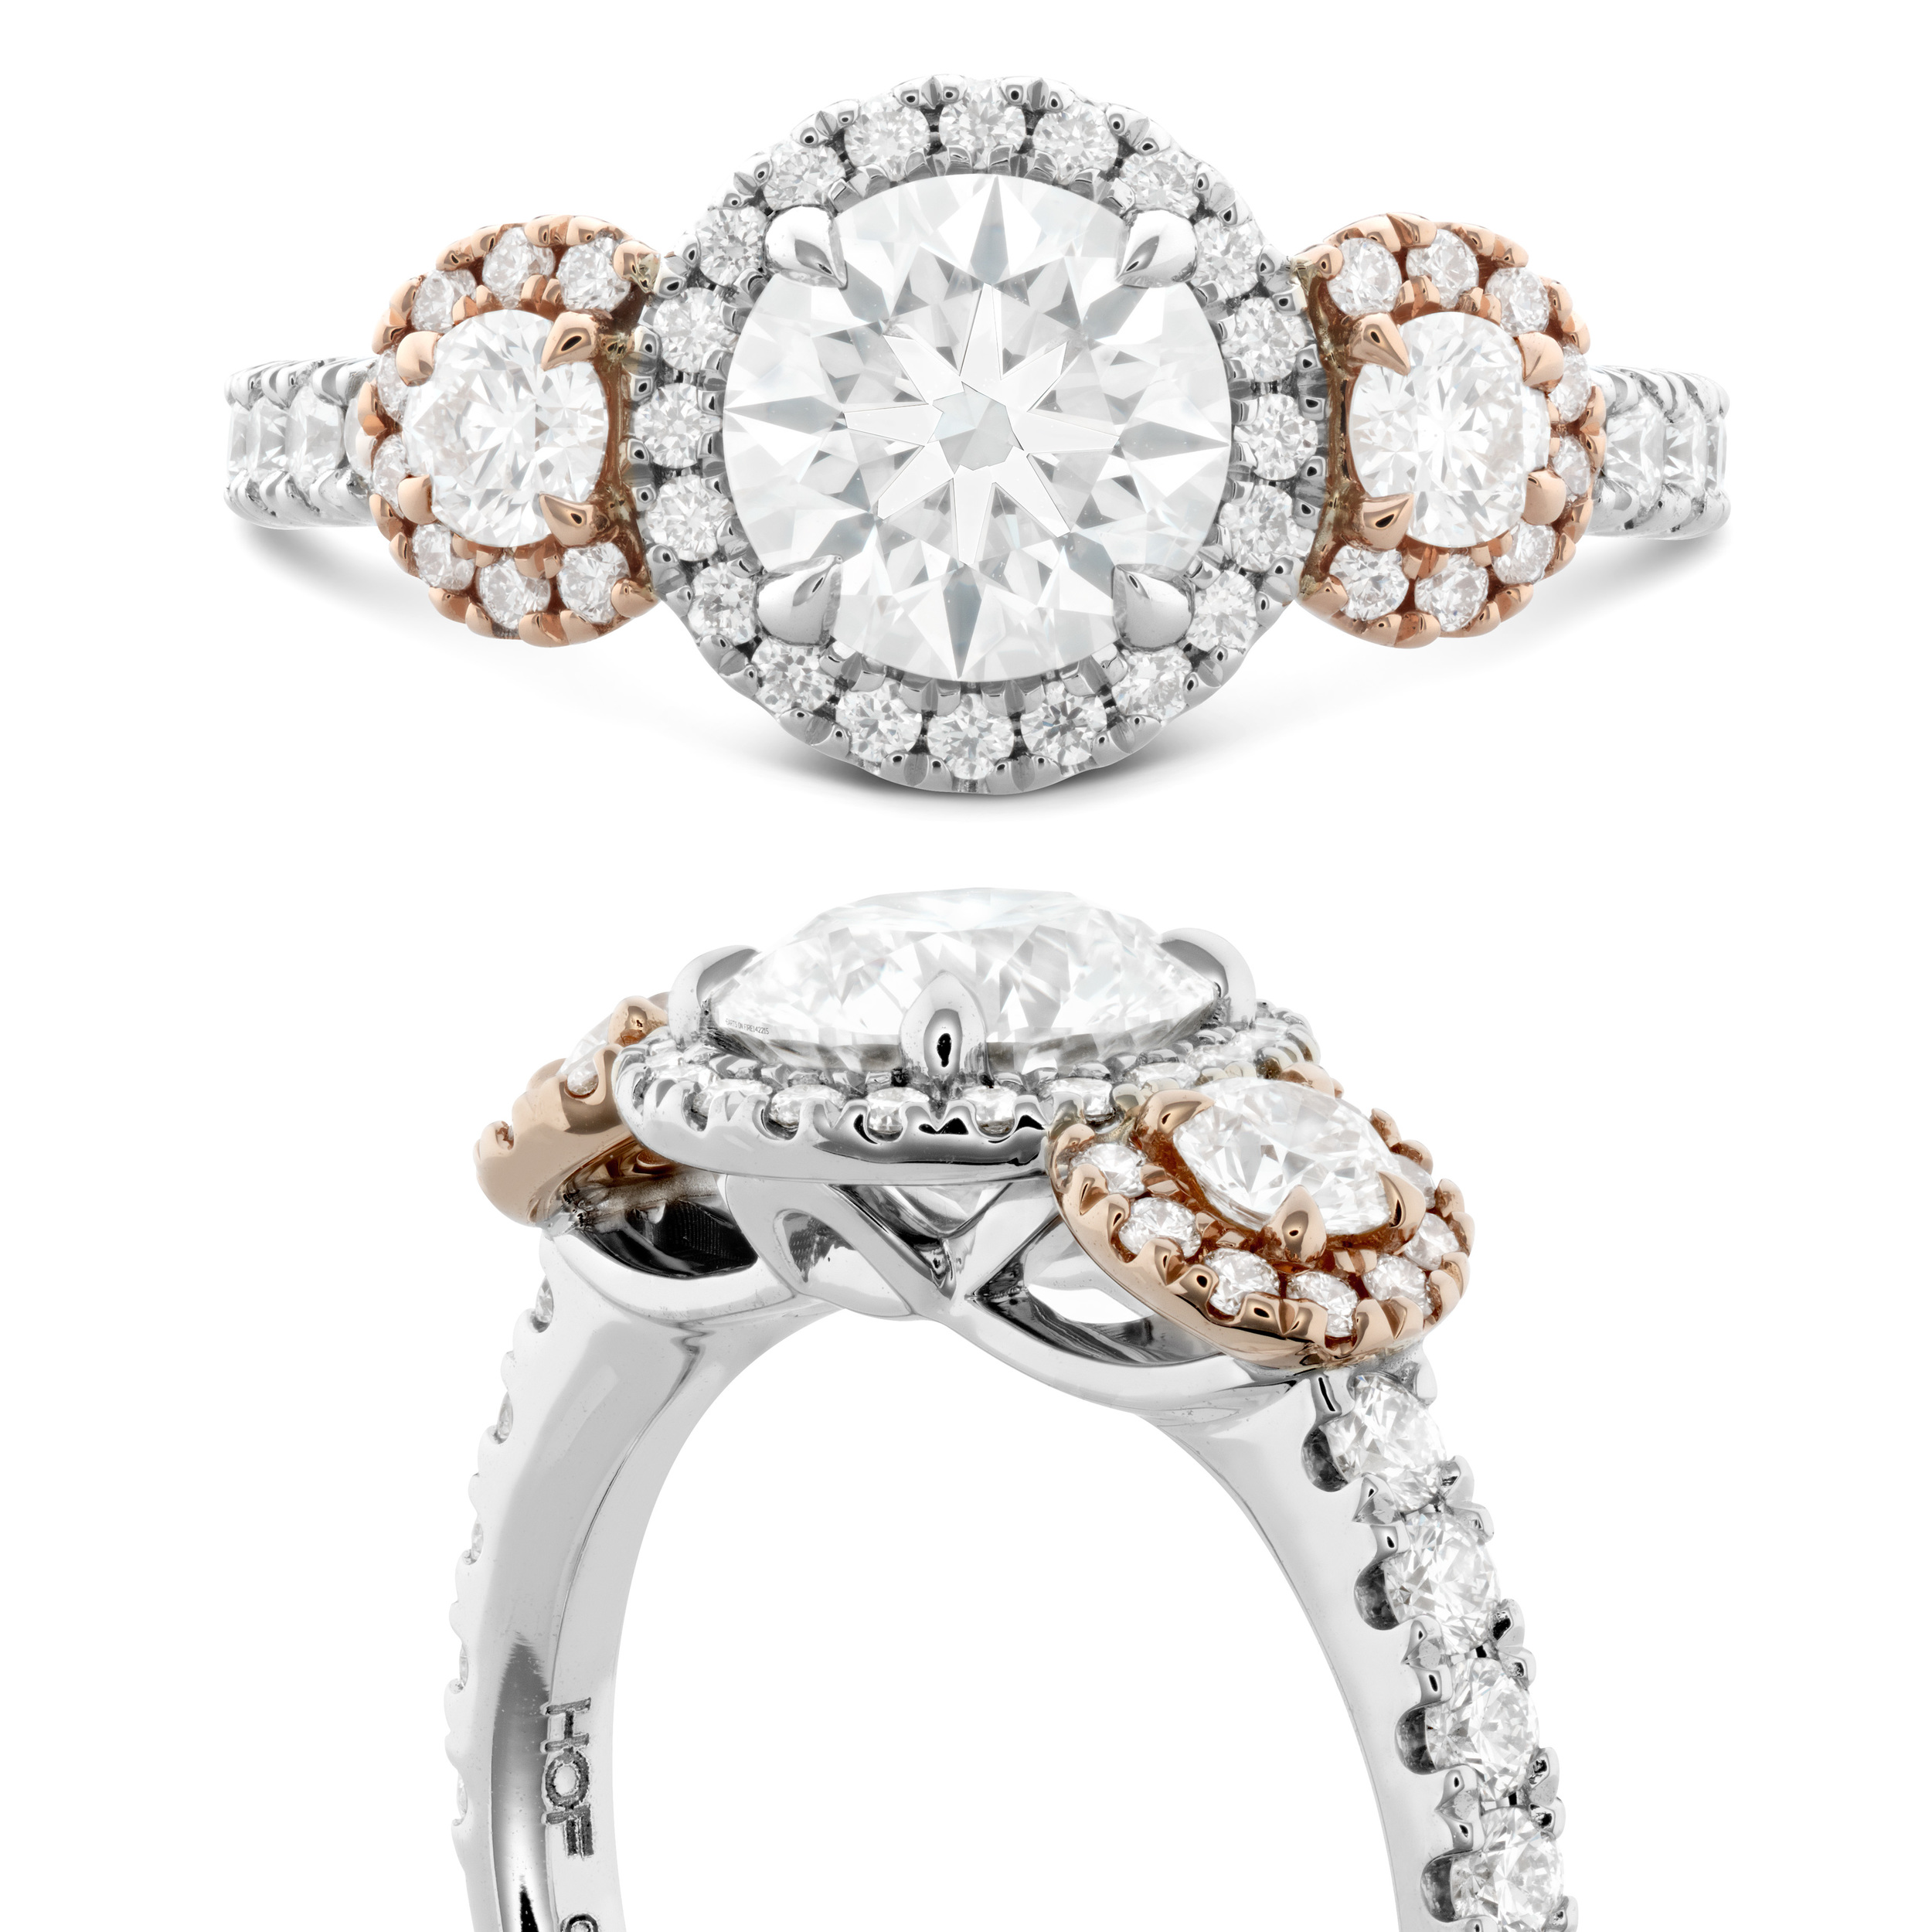 Hearts on Fire Ring   Van Gundy Jewelers   Camarillo CA